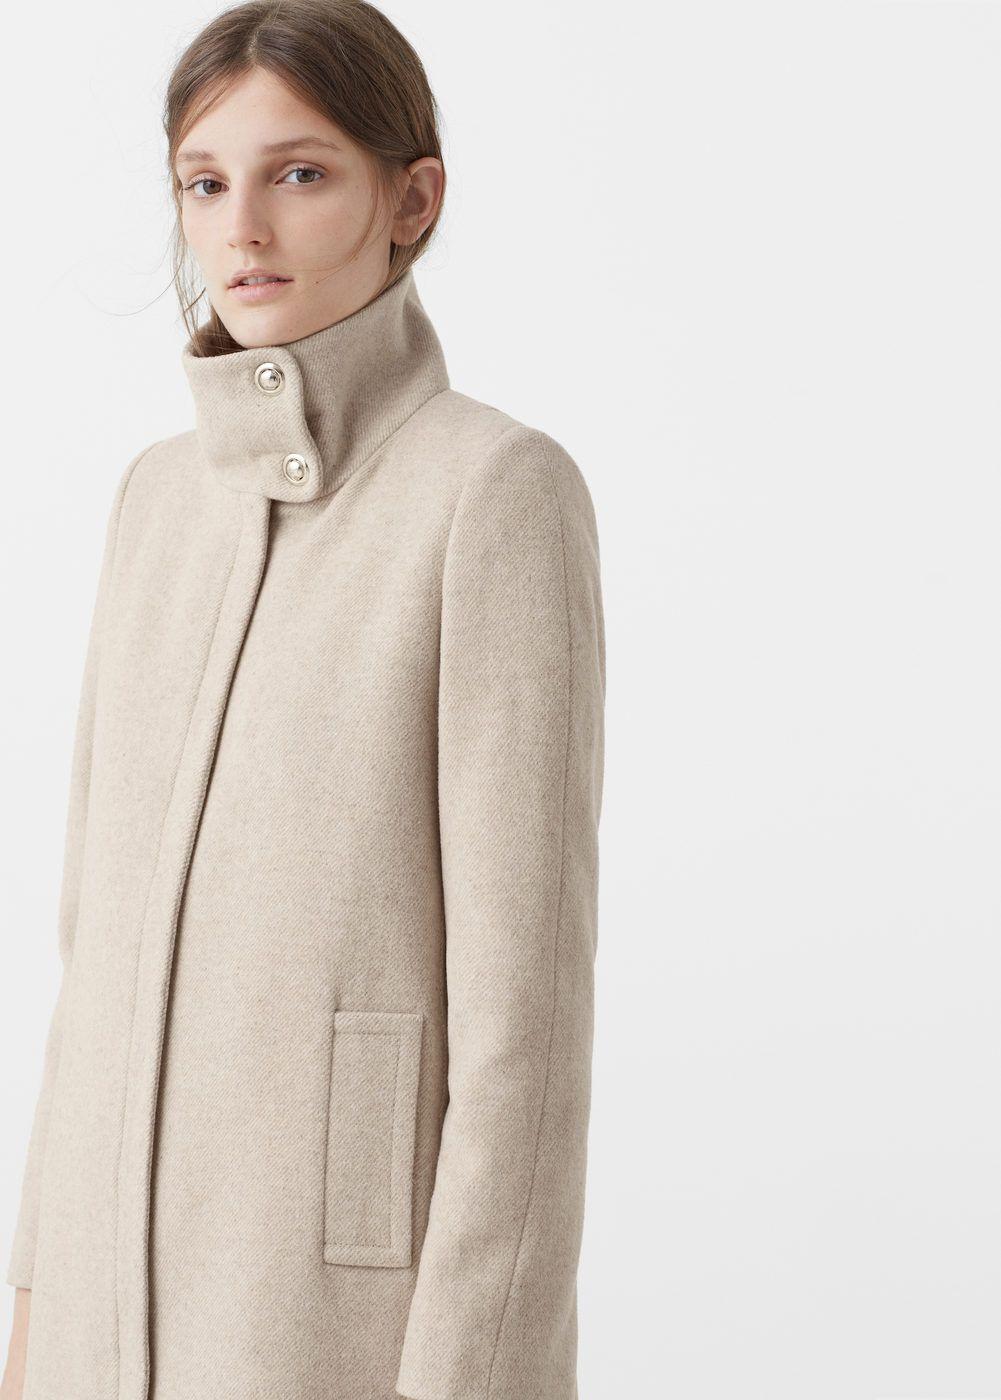 Gerade geschnittener woll mantel Damen | Wintermantel